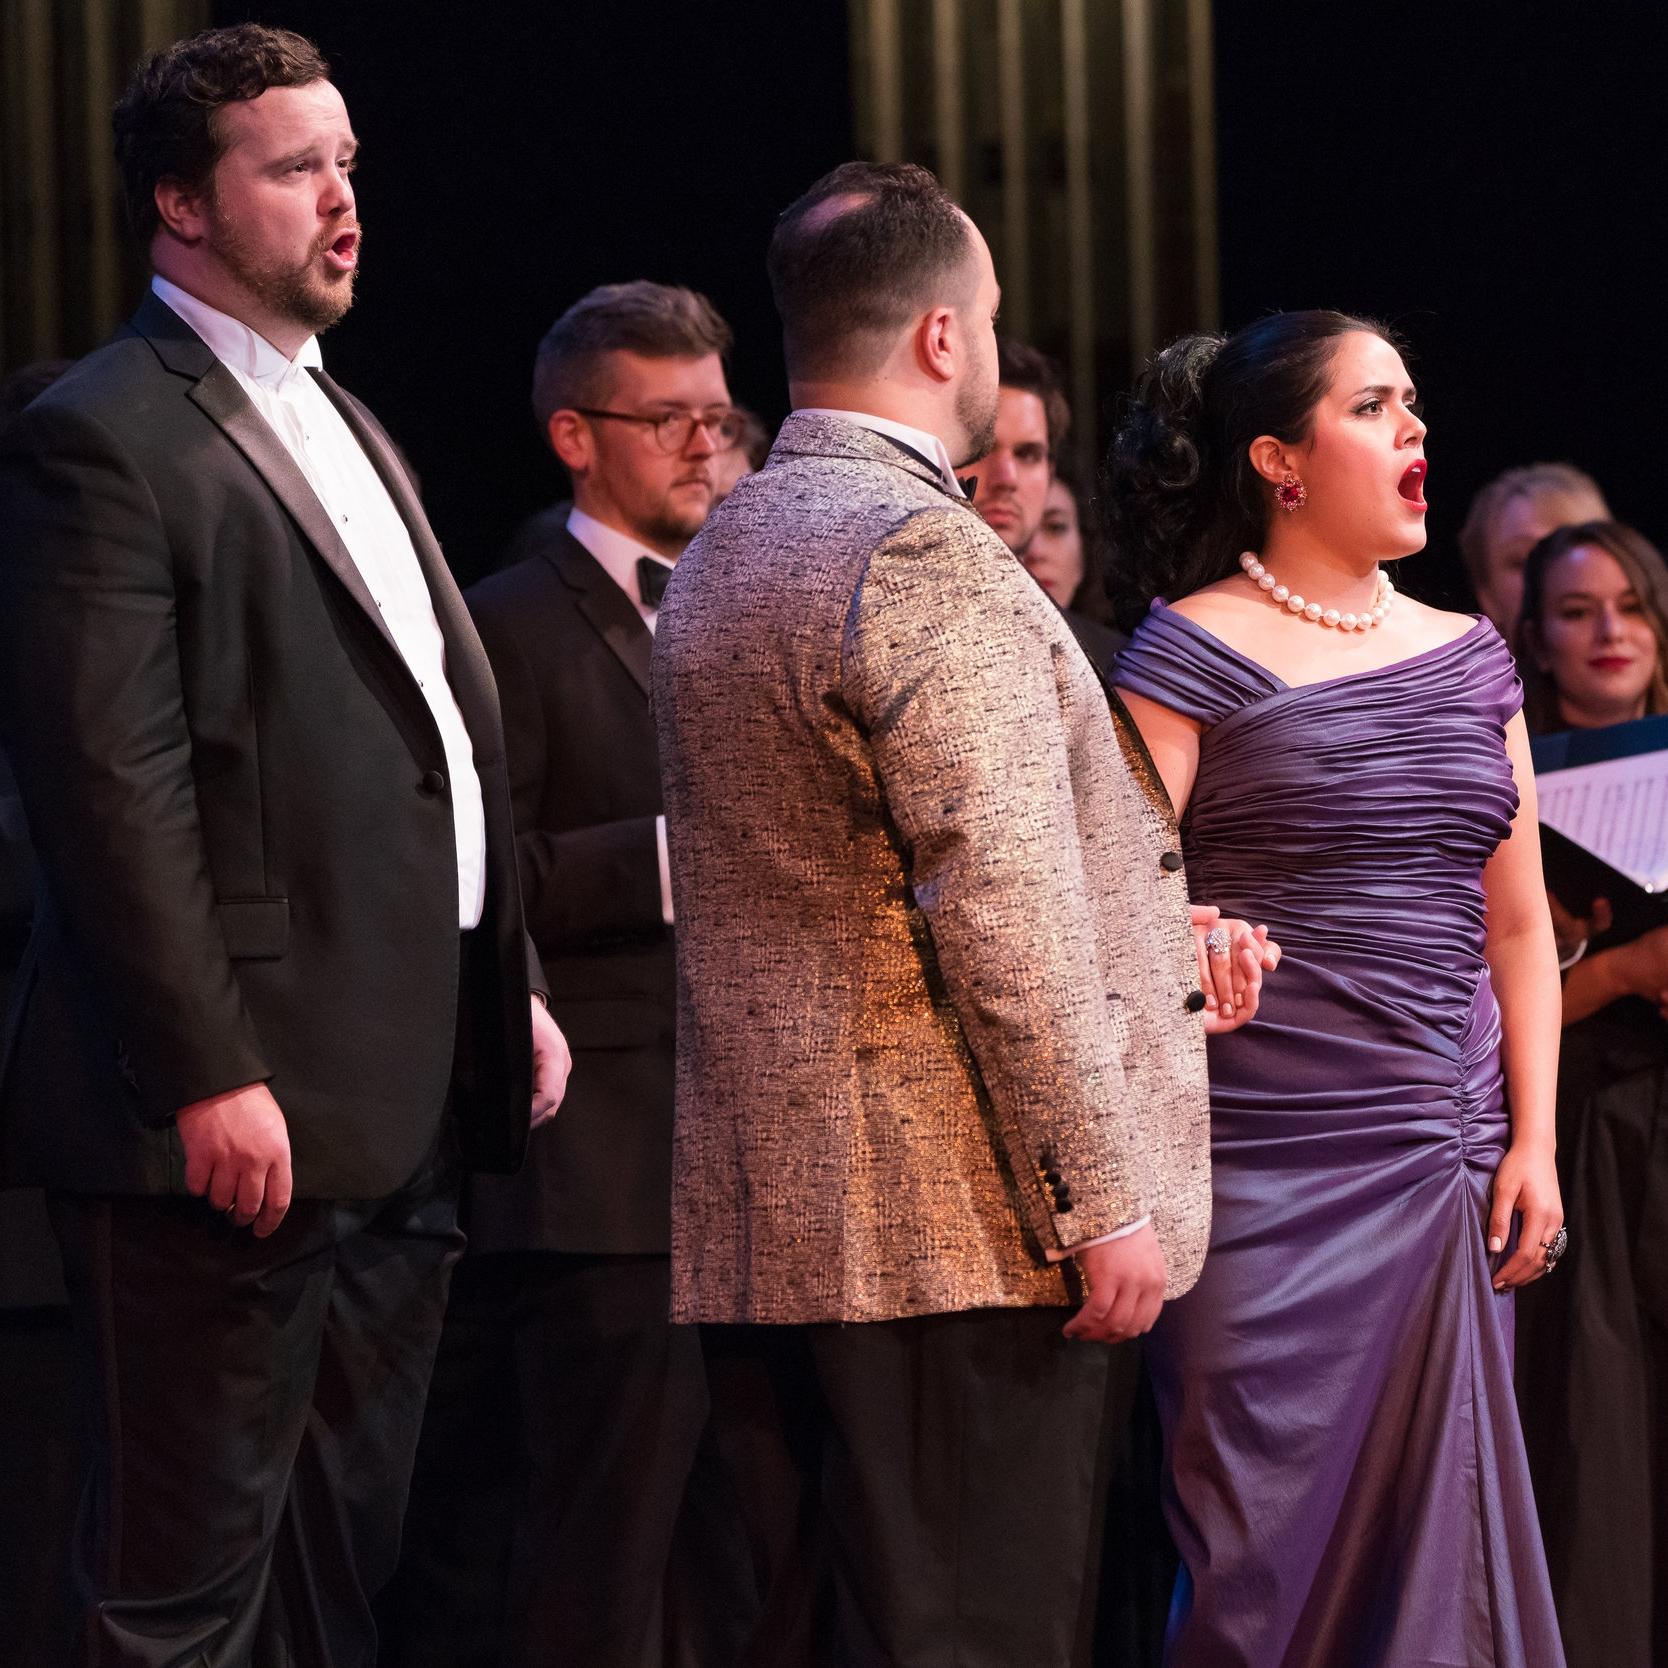 Taminophile: Medea at Teatro Nuovo - July 30, 2018